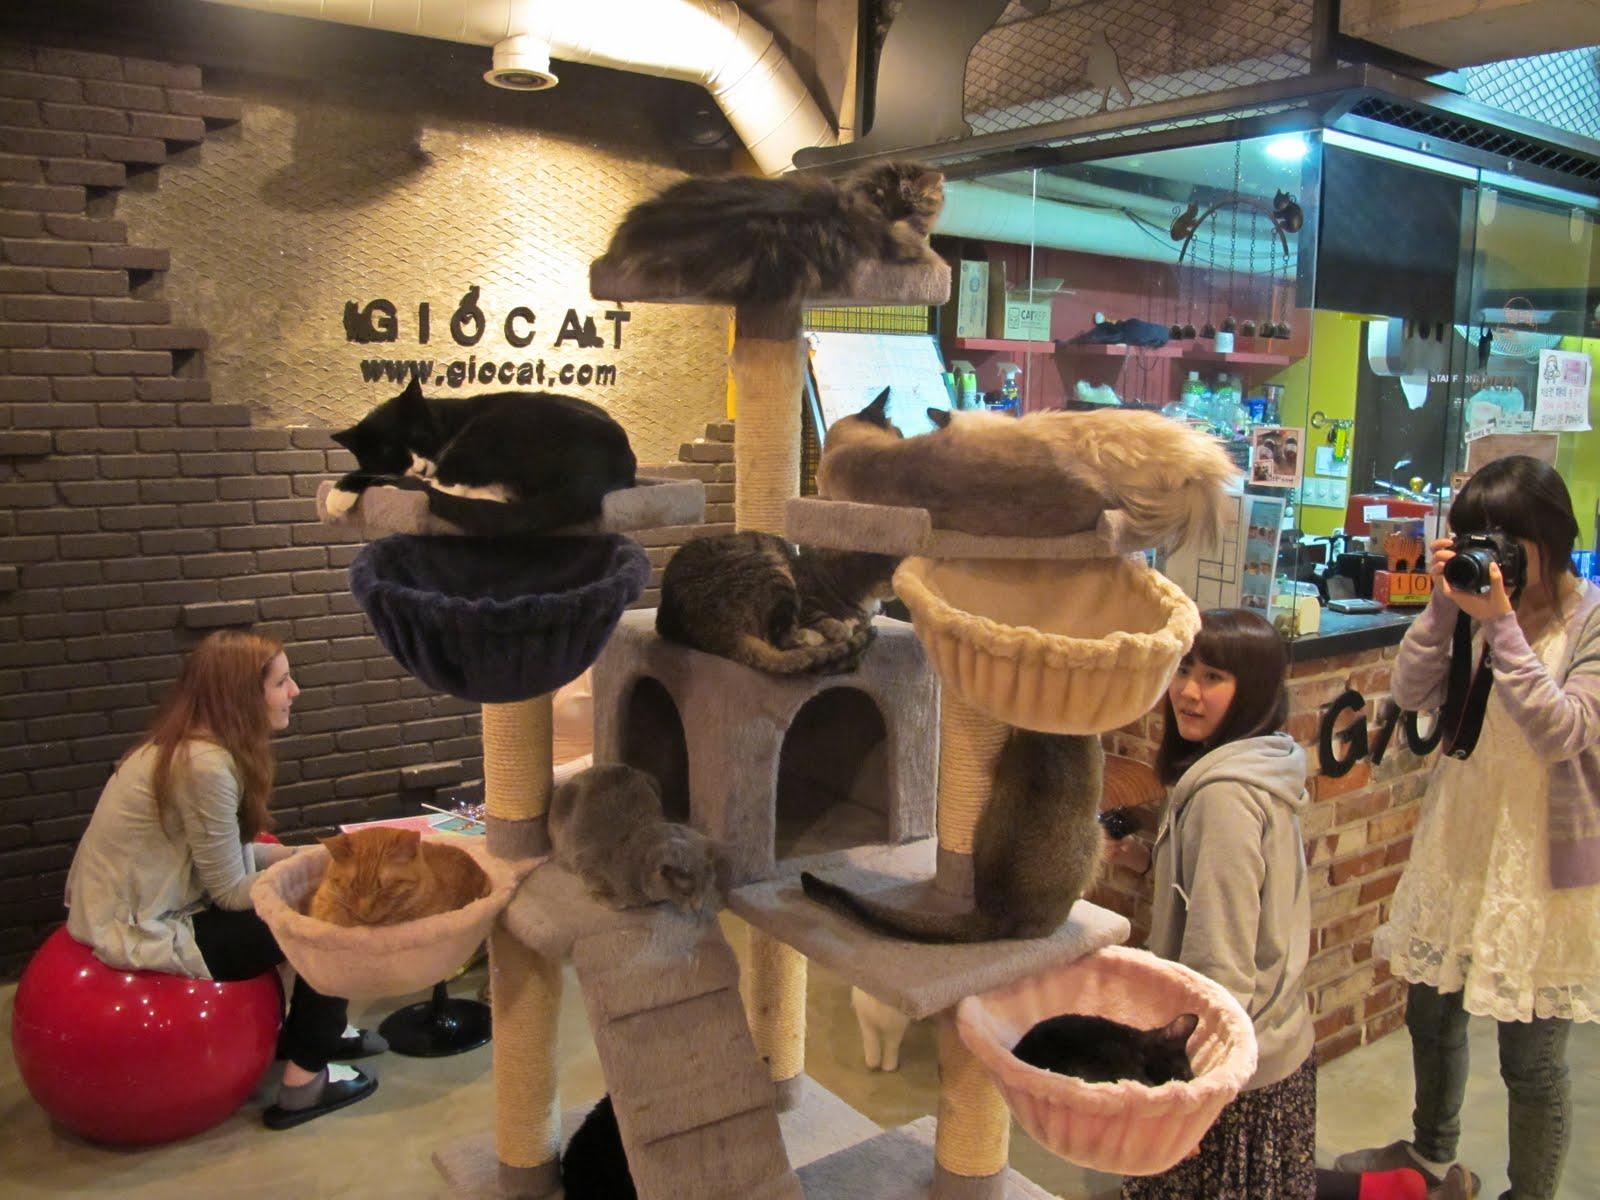 Cat In Japanese Restaurant